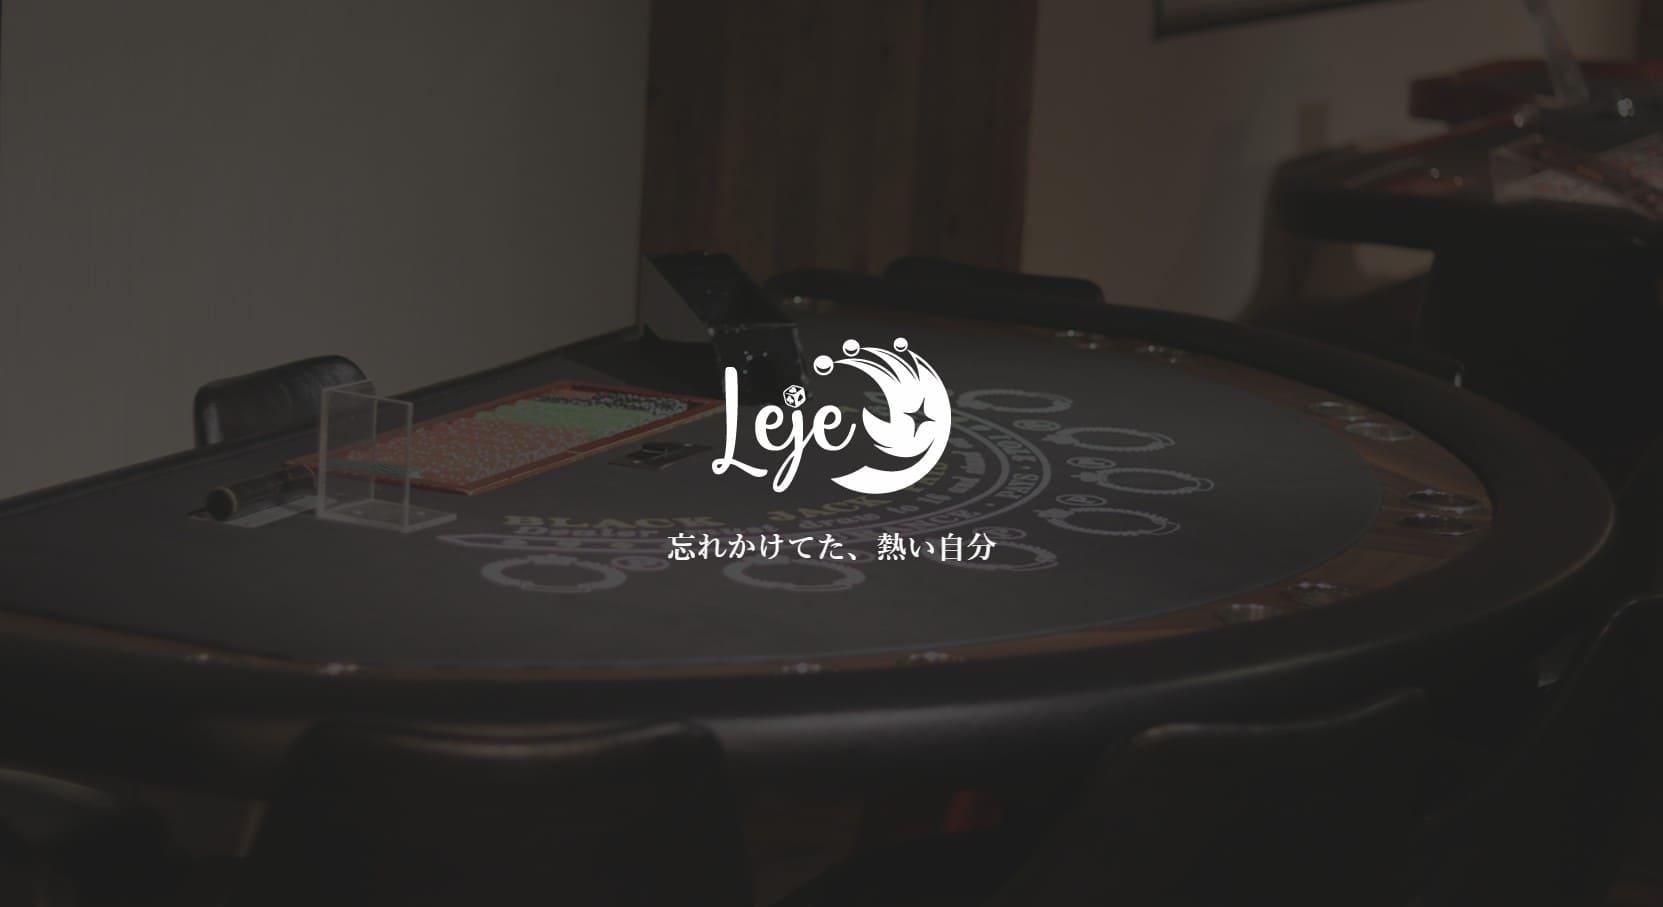 Amusement bar Lejeのウェブサイト画像。